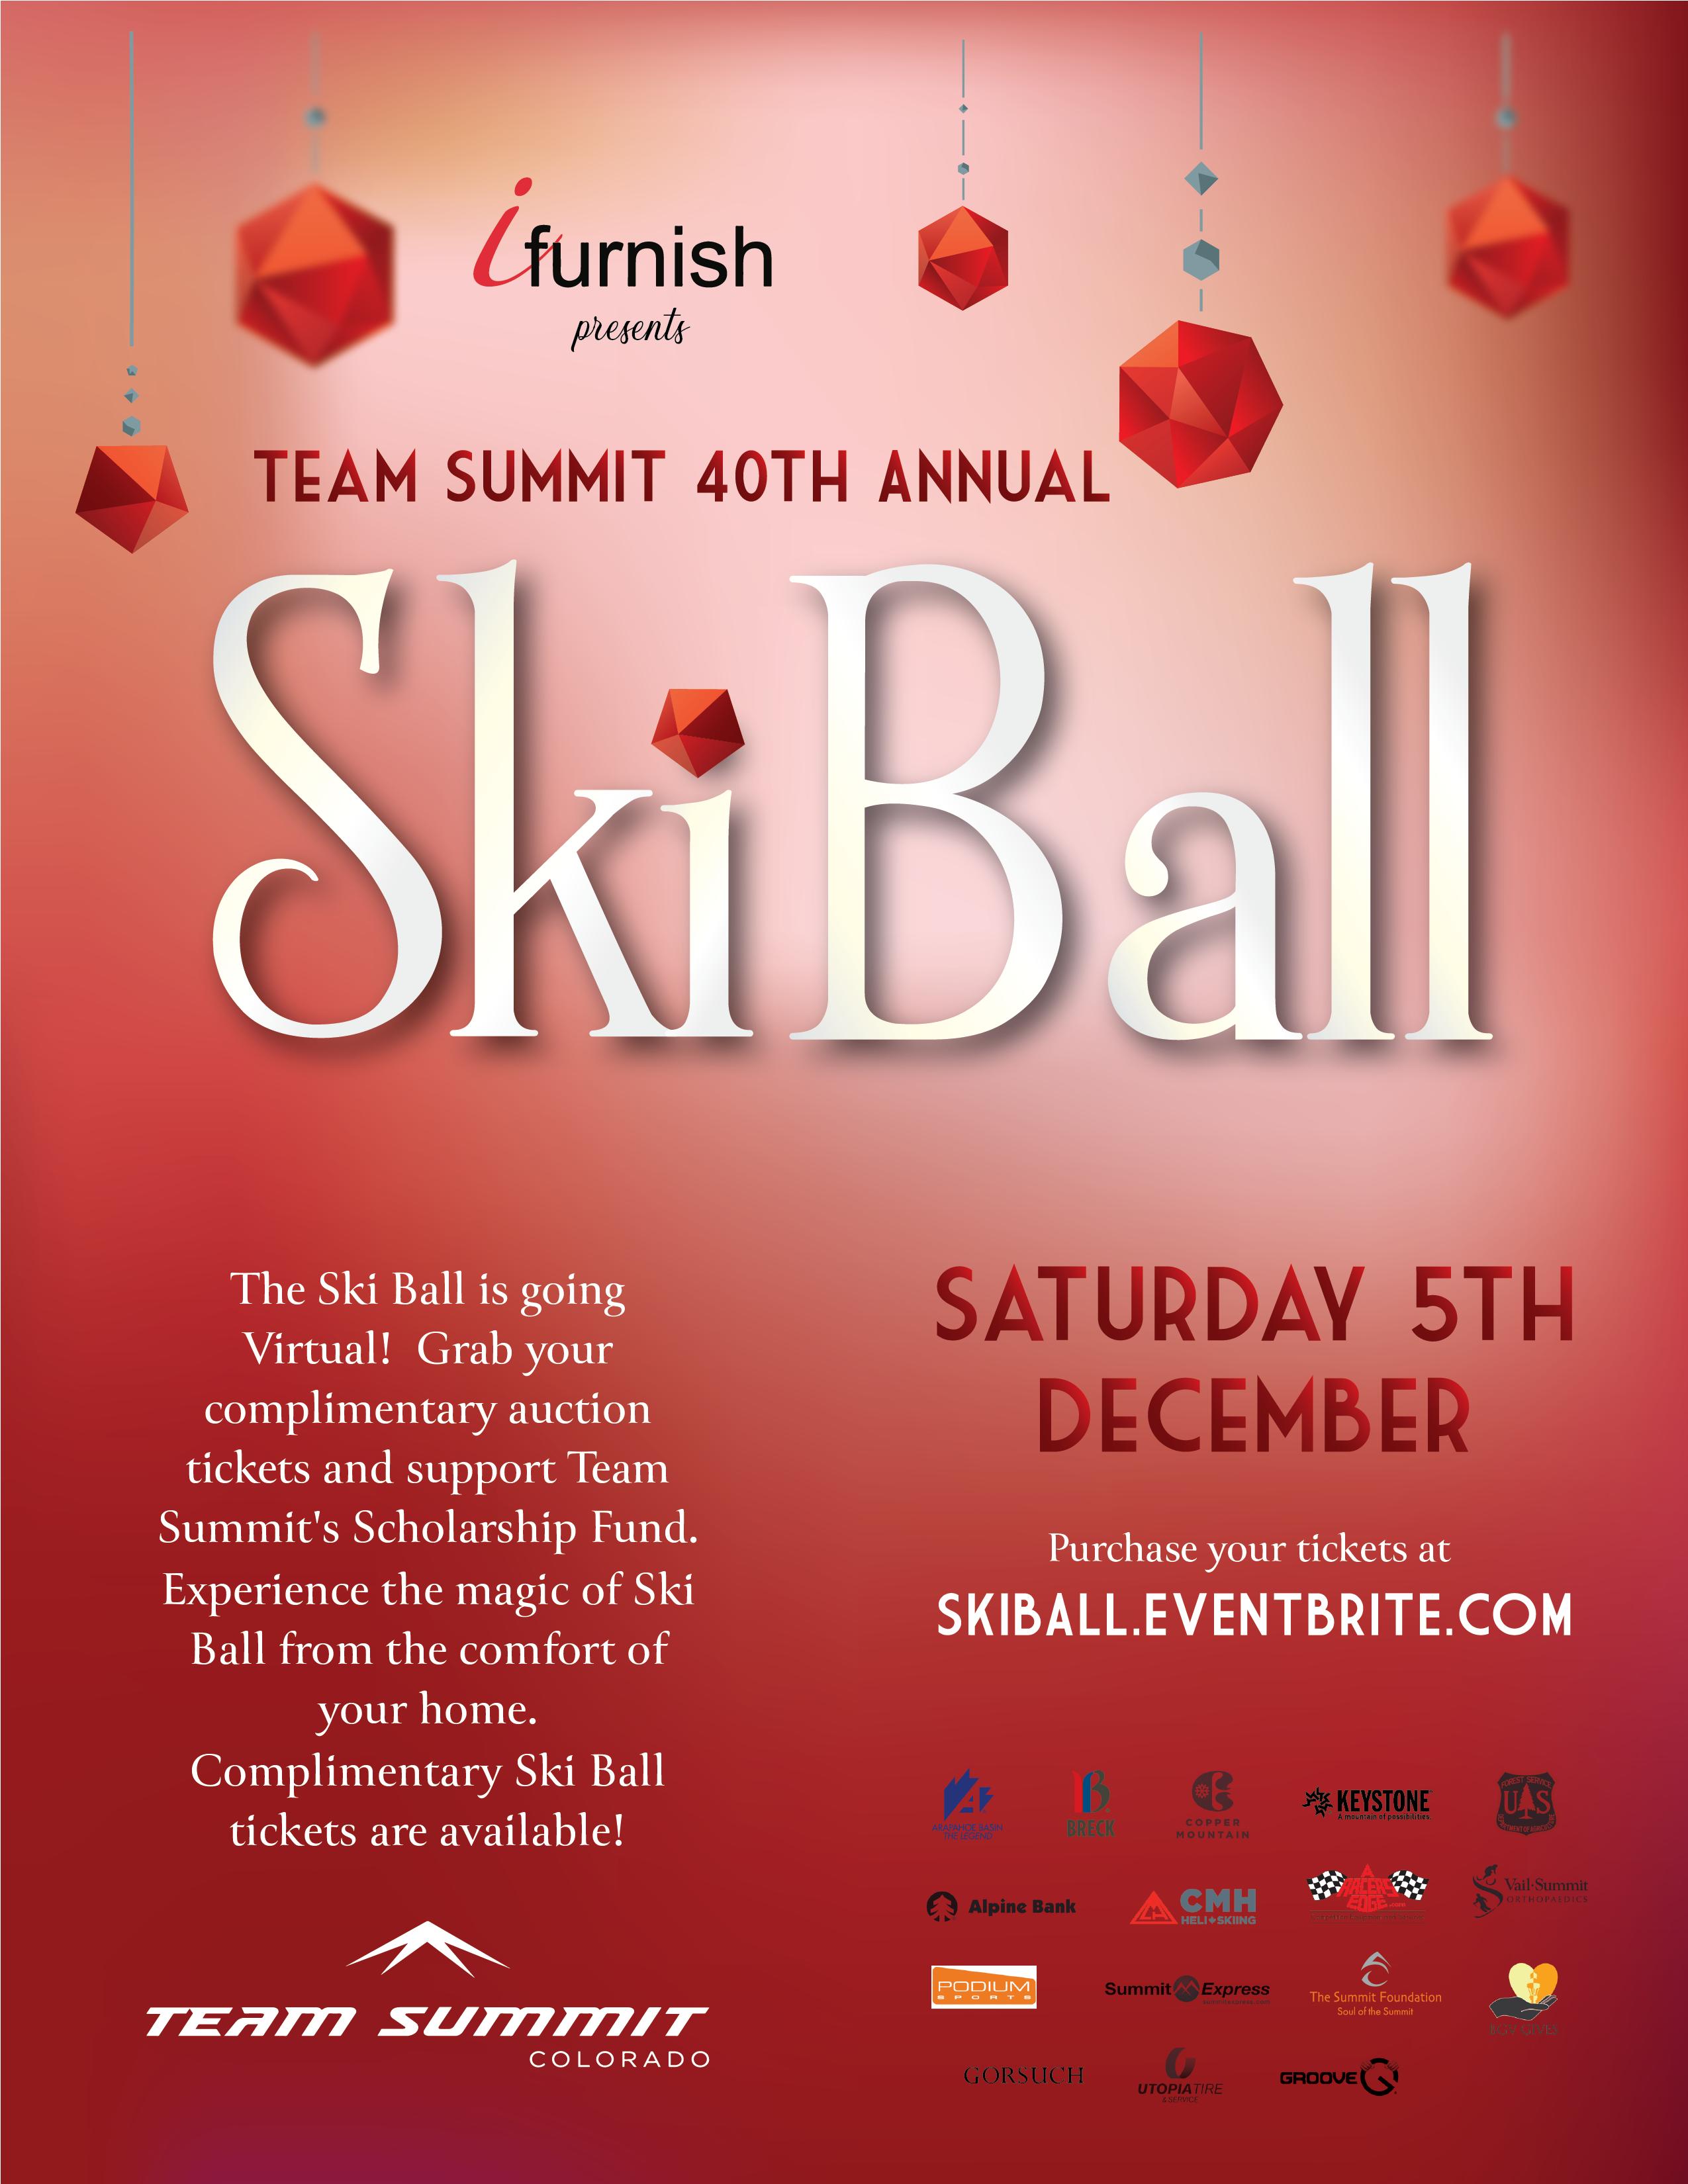 skiball-01.png